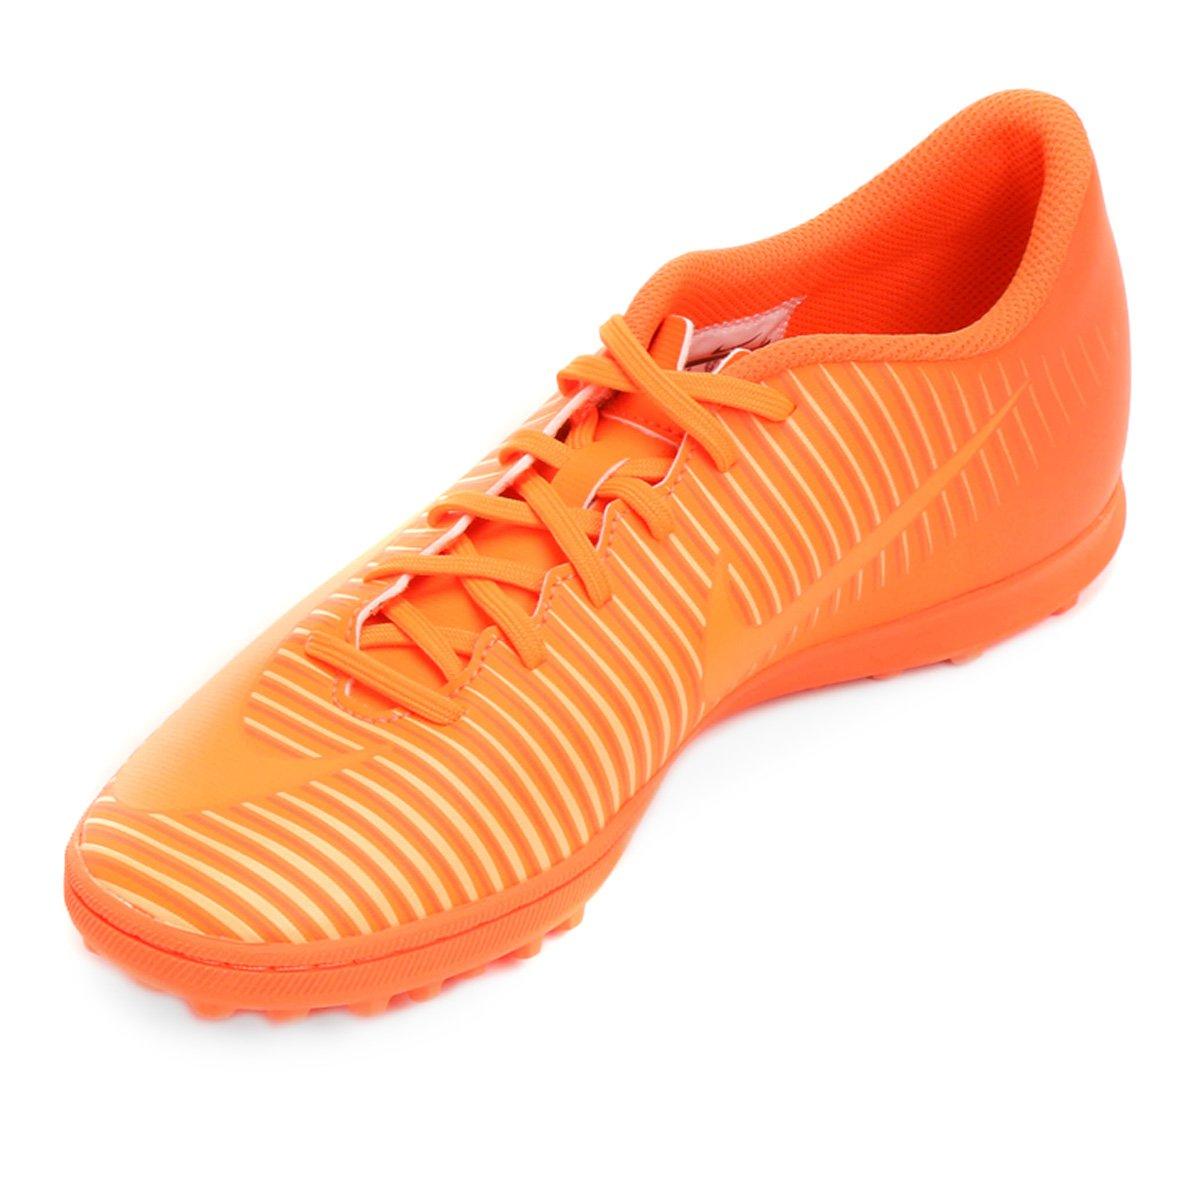 Chuteira Society Nike Mercurial Vortex 3 TF - Laranja - Compre Agora ... cf95b482e1583